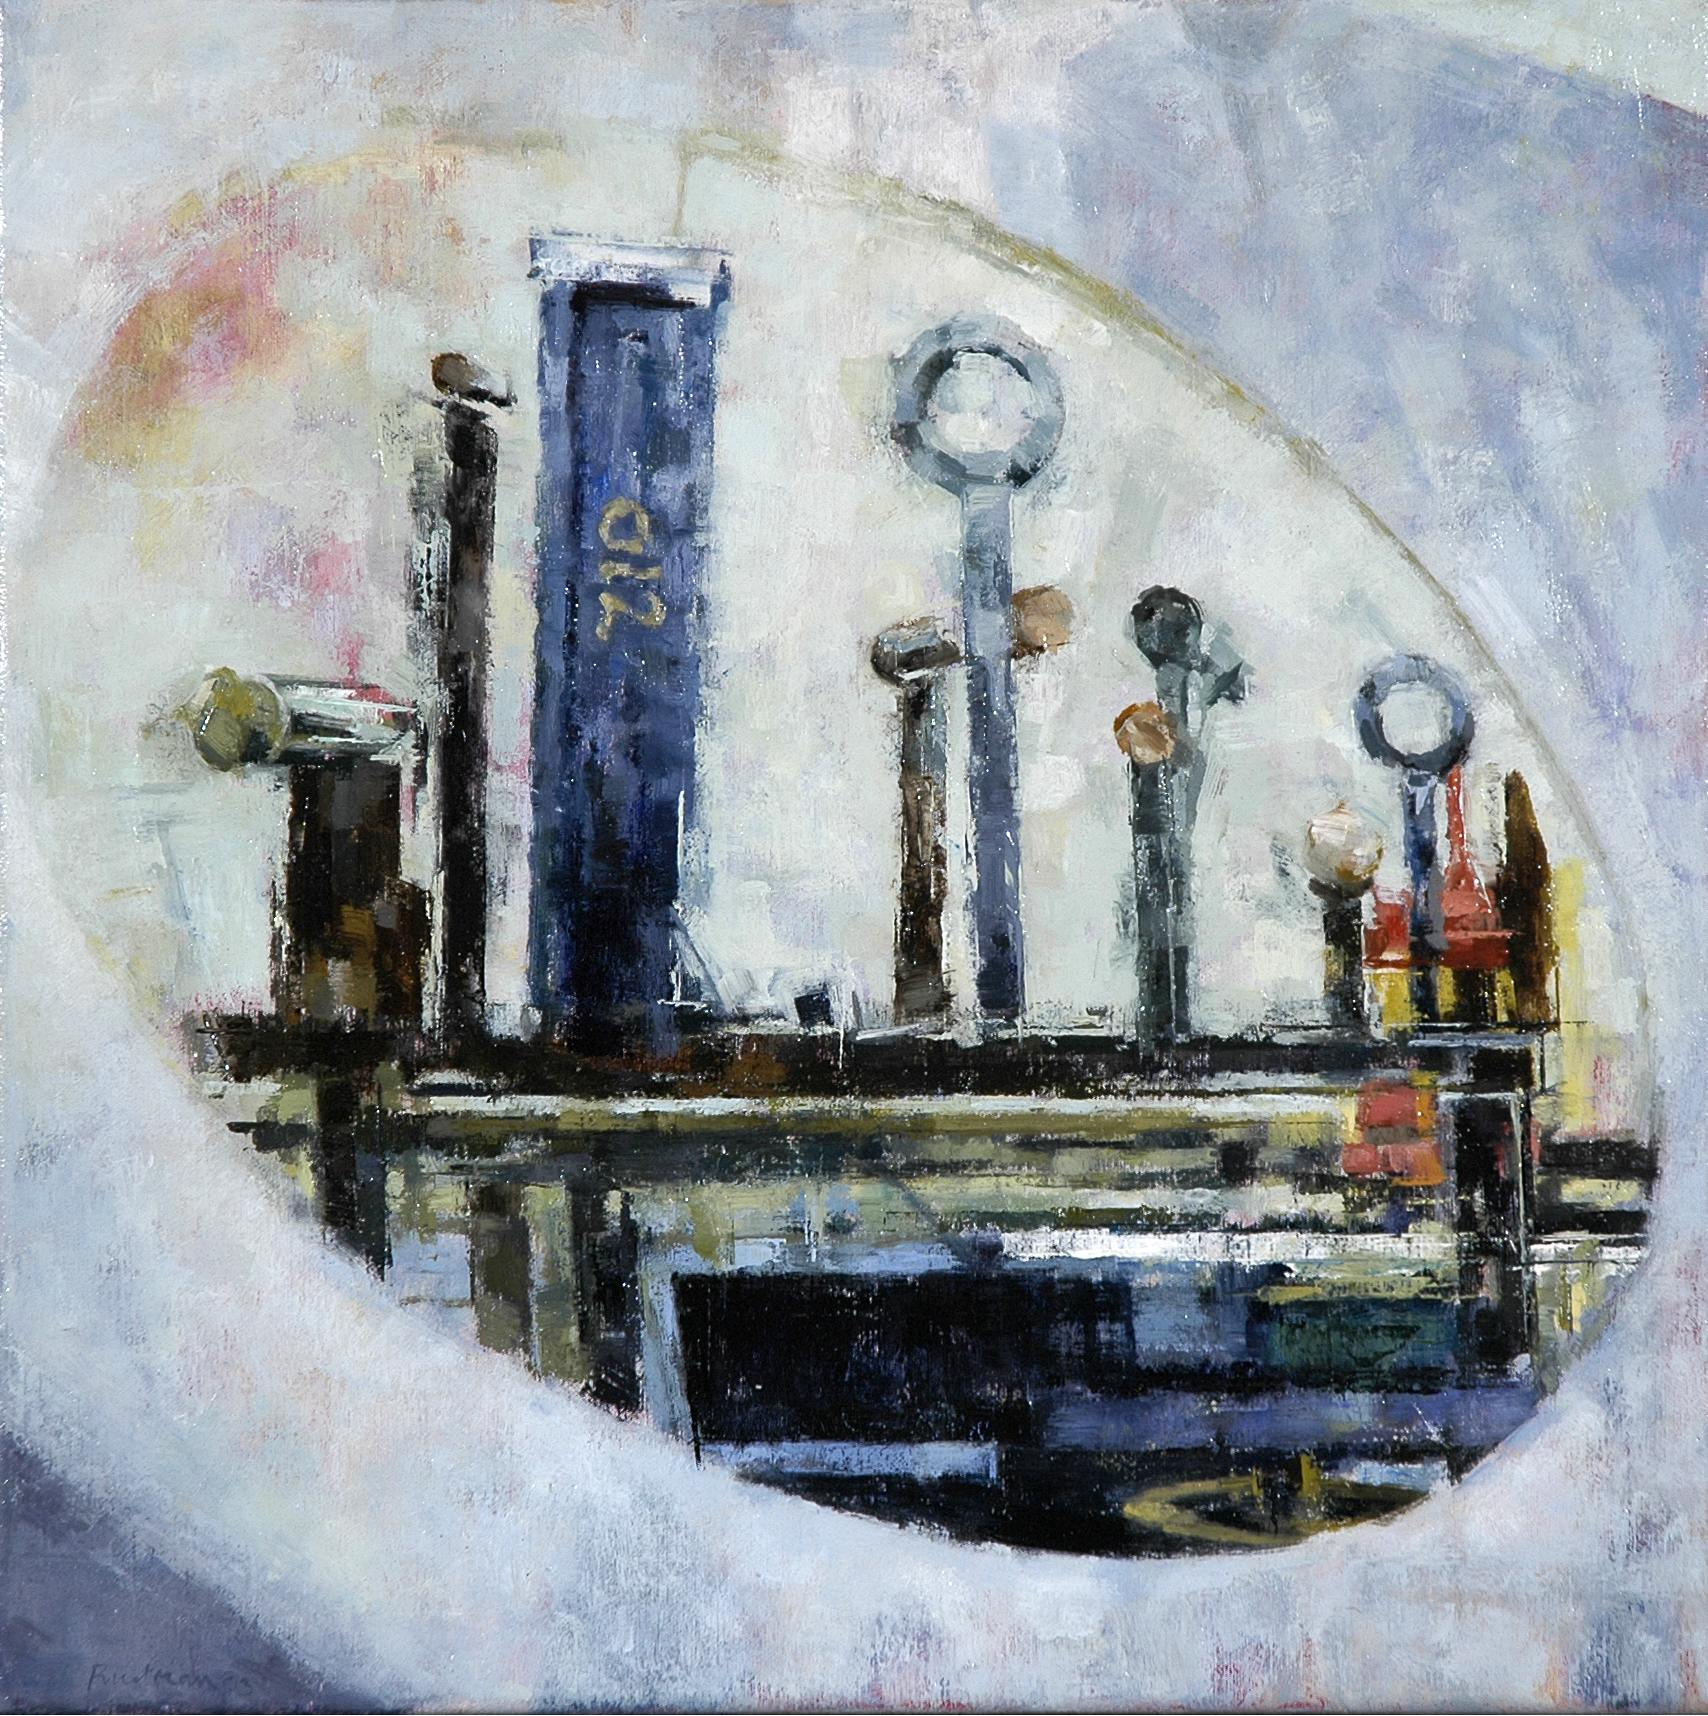 Retek - Jigs - 2003